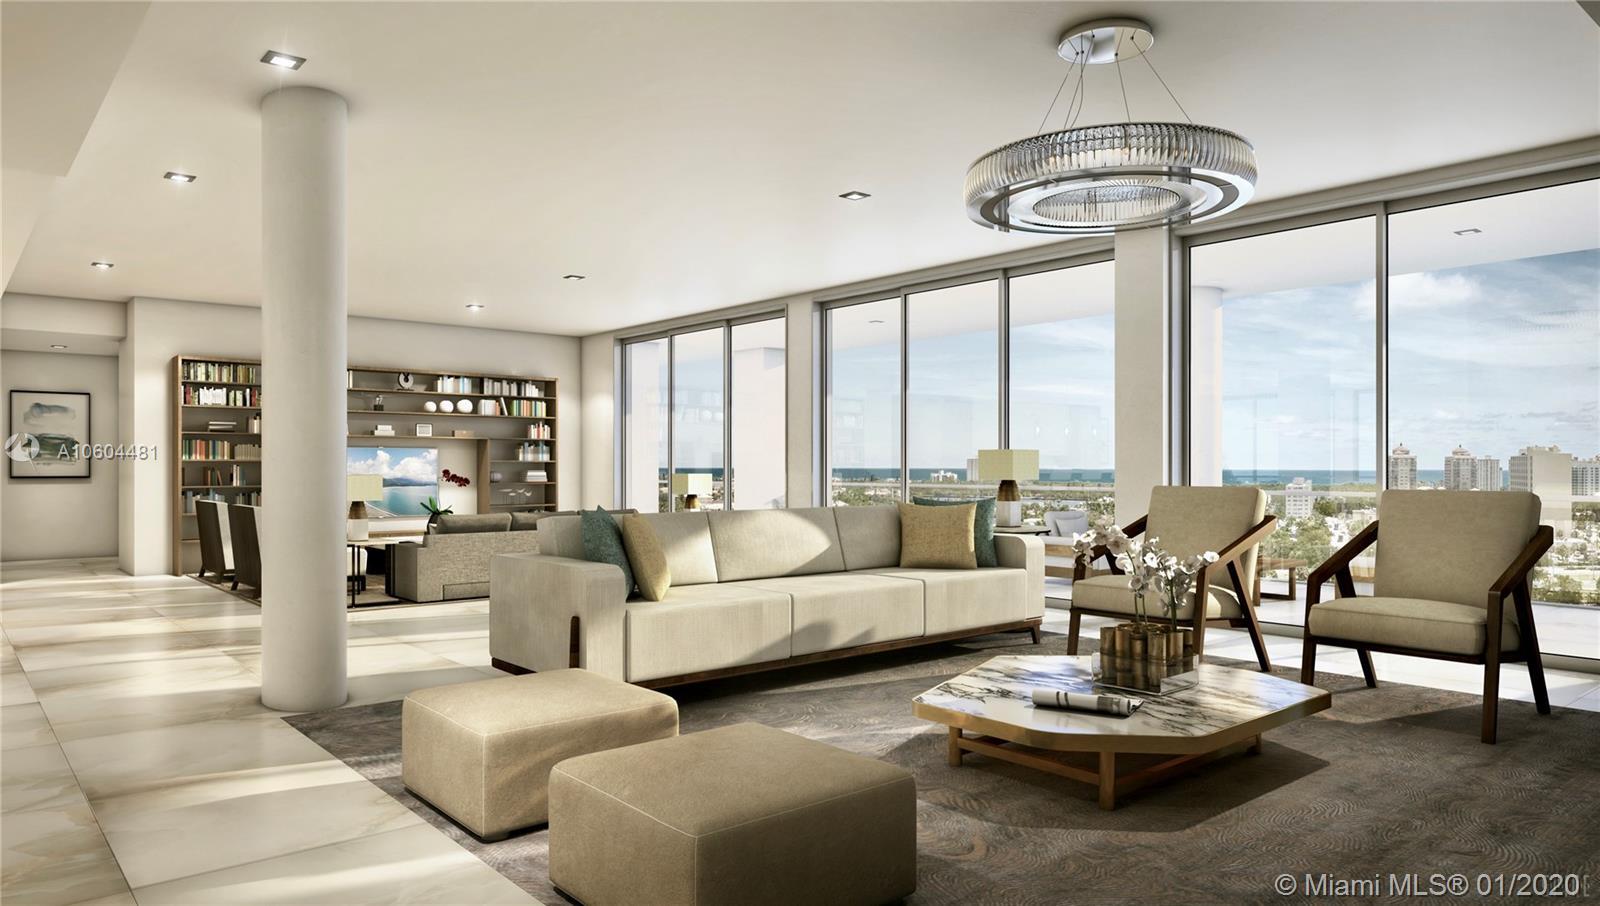 1180 N Federal Hwy #PH1606, Fort Lauderdale, FL 33304 - Fort Lauderdale, FL real estate listing